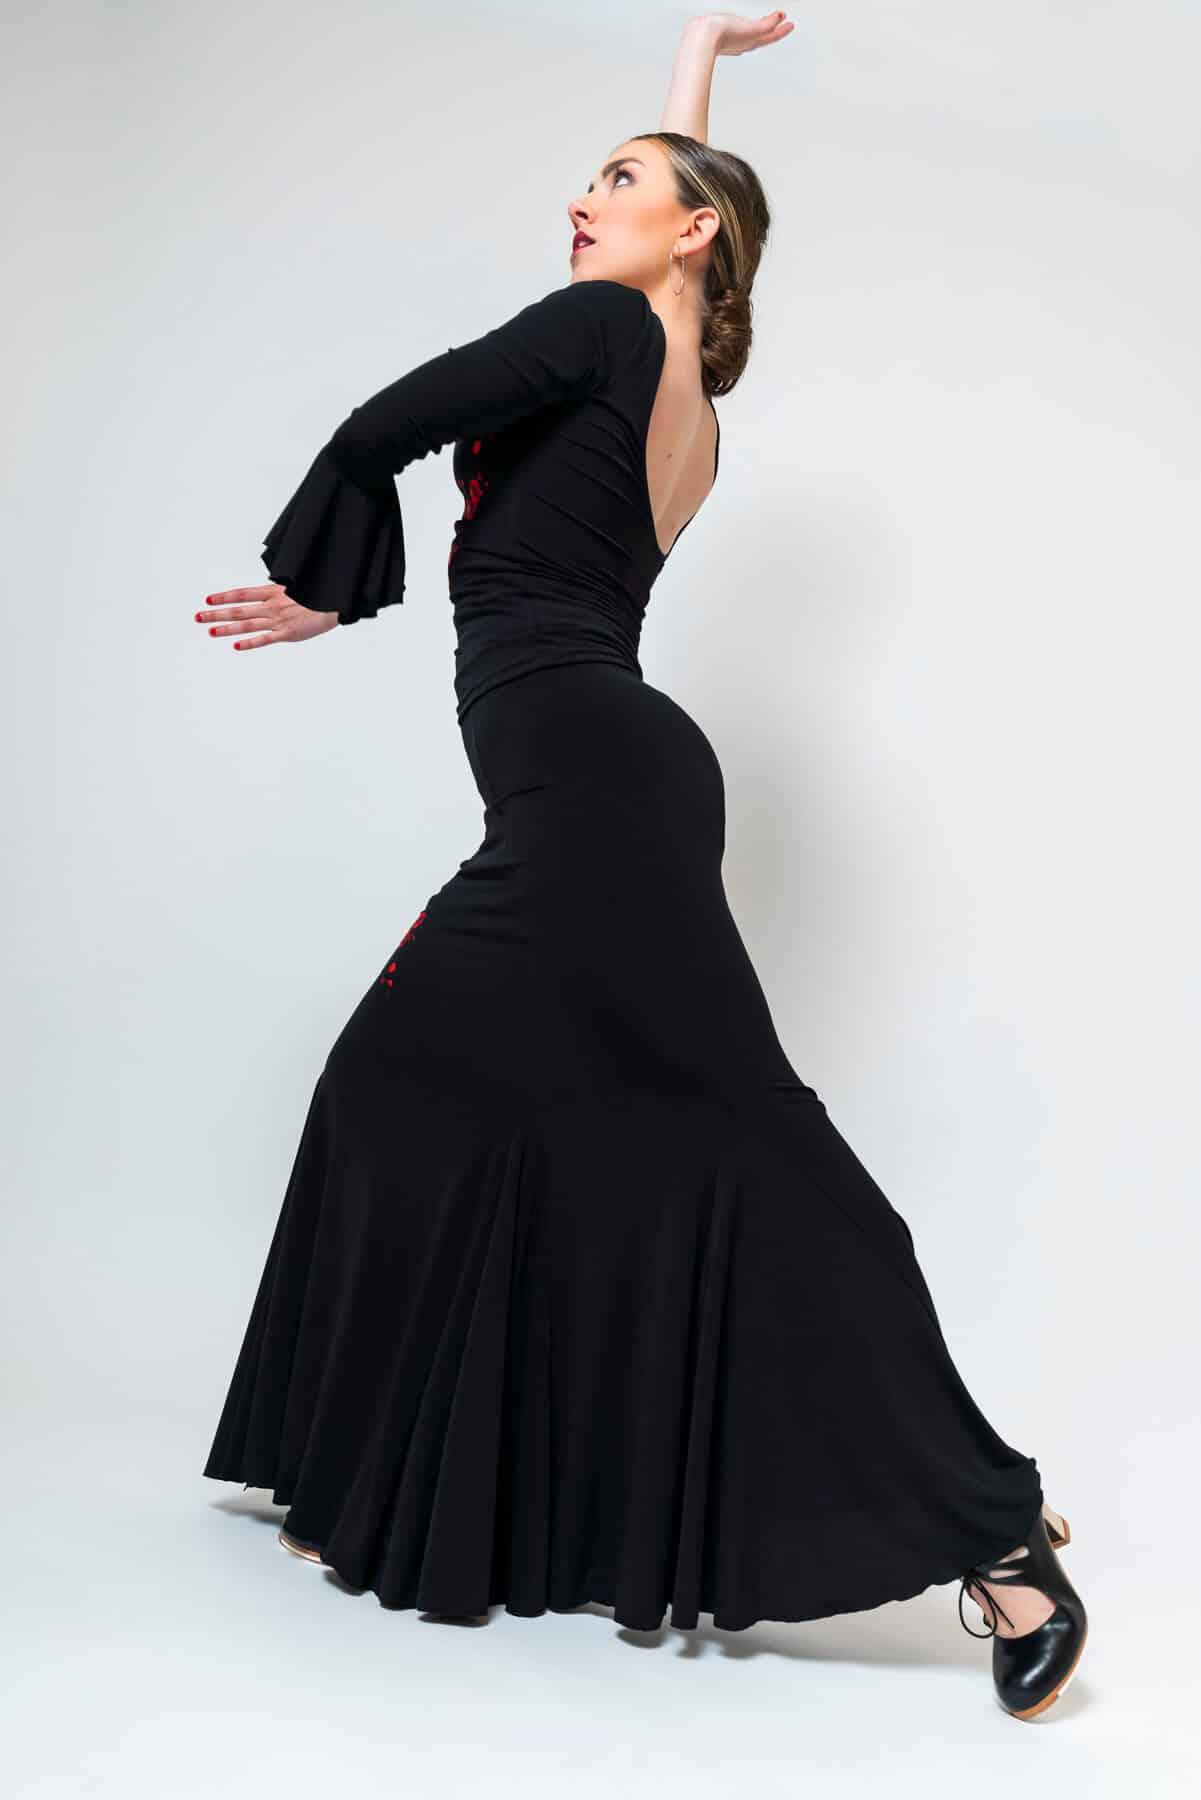 Falda negra con flores flamenco 4313